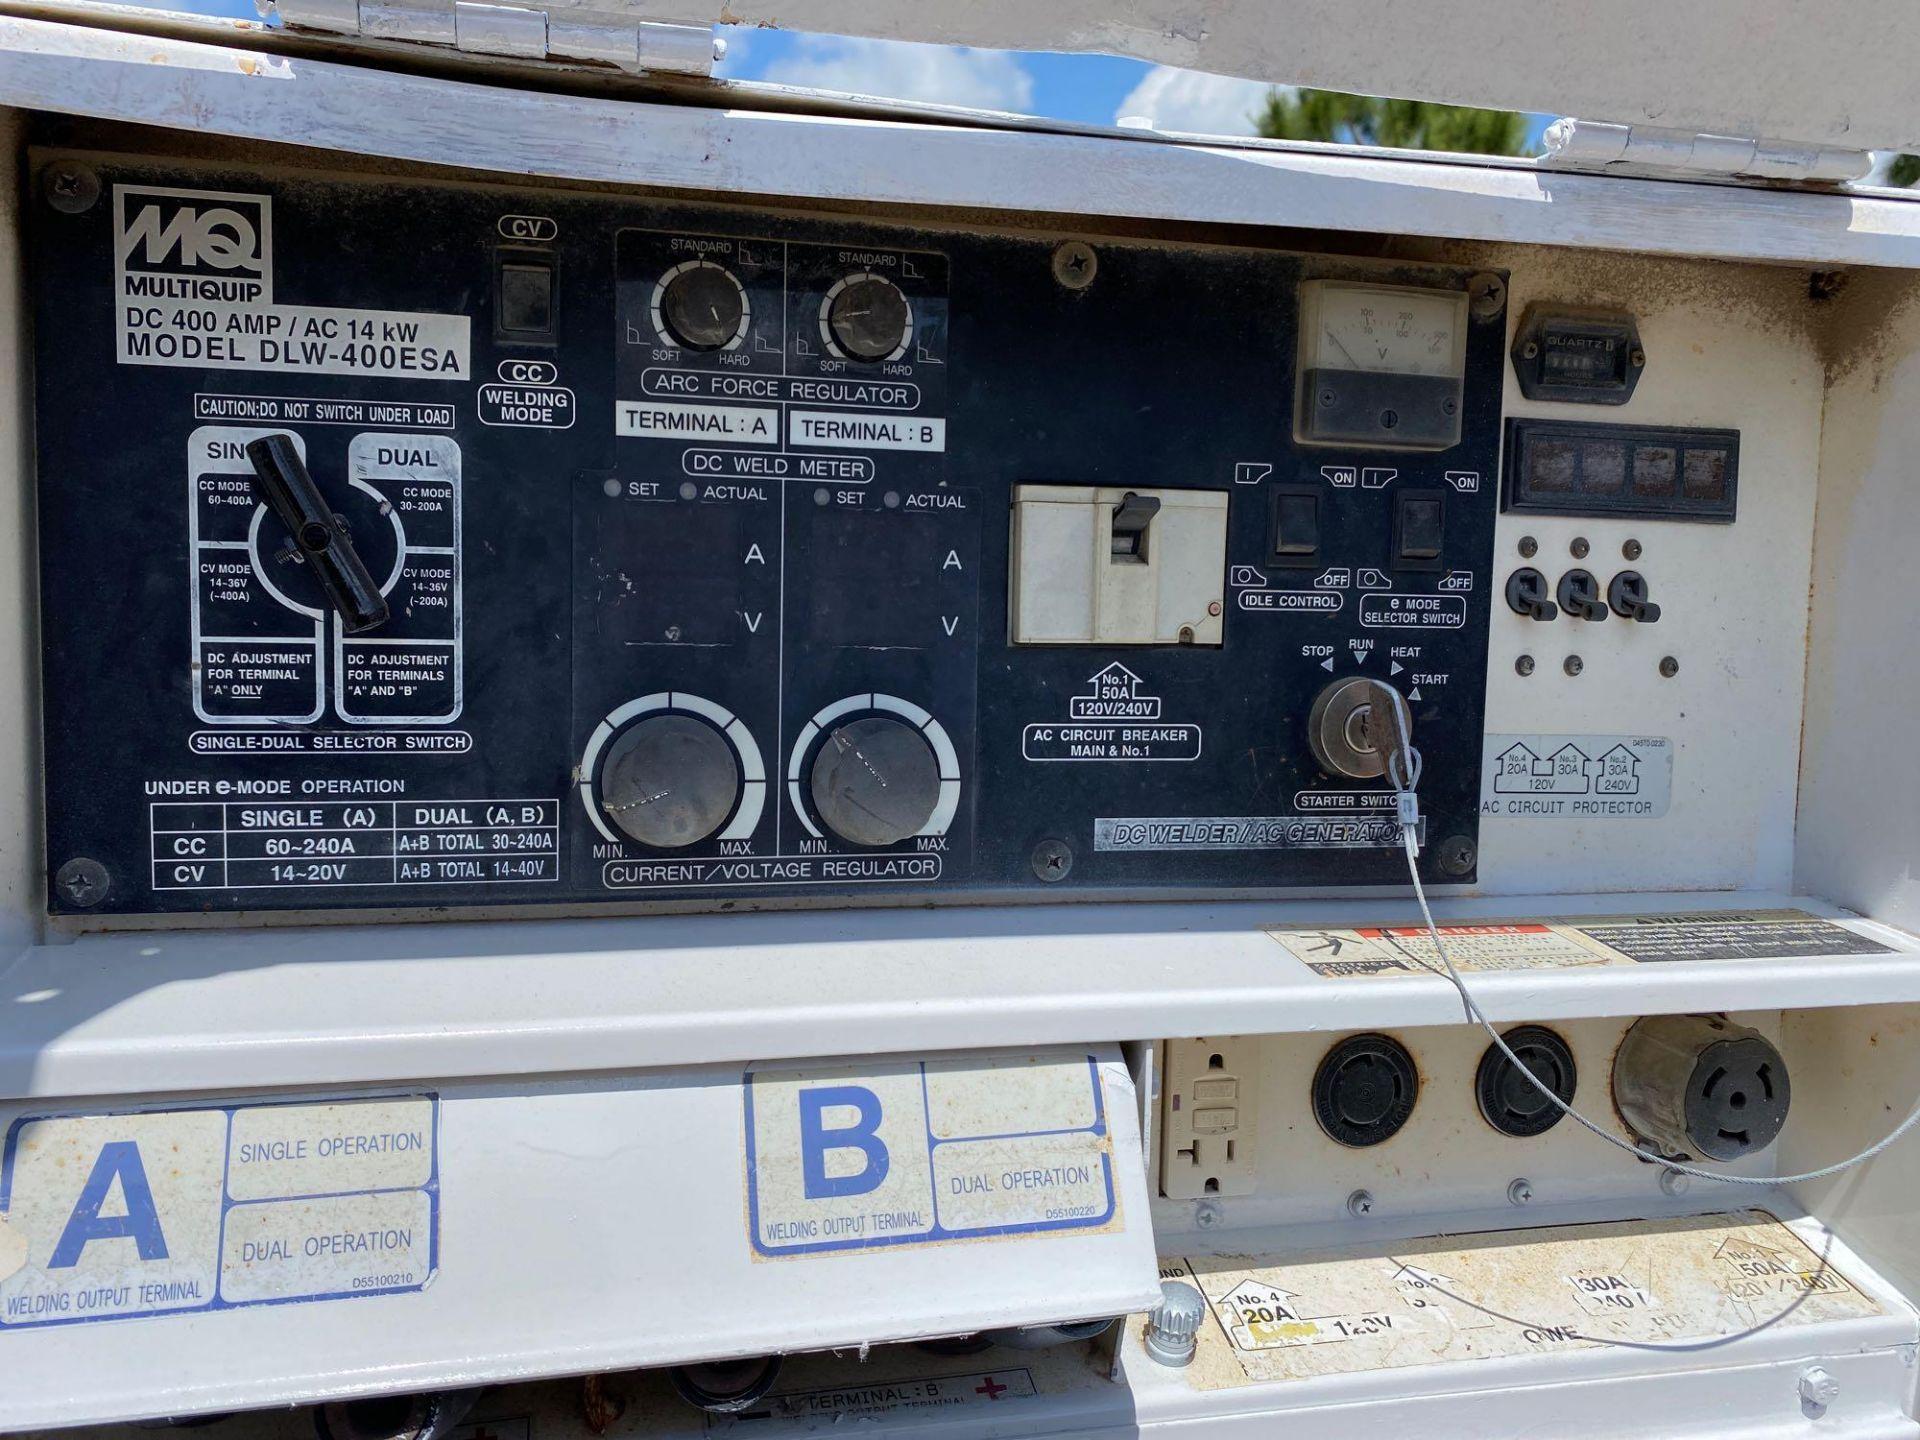 Lot 186 - WHISPERWELD 400 AMP DC WELDER/14 KW GENERATOR, MODEL DLW-400 ESA, TRAILER MOUNTED, RUNS AND OPERATES